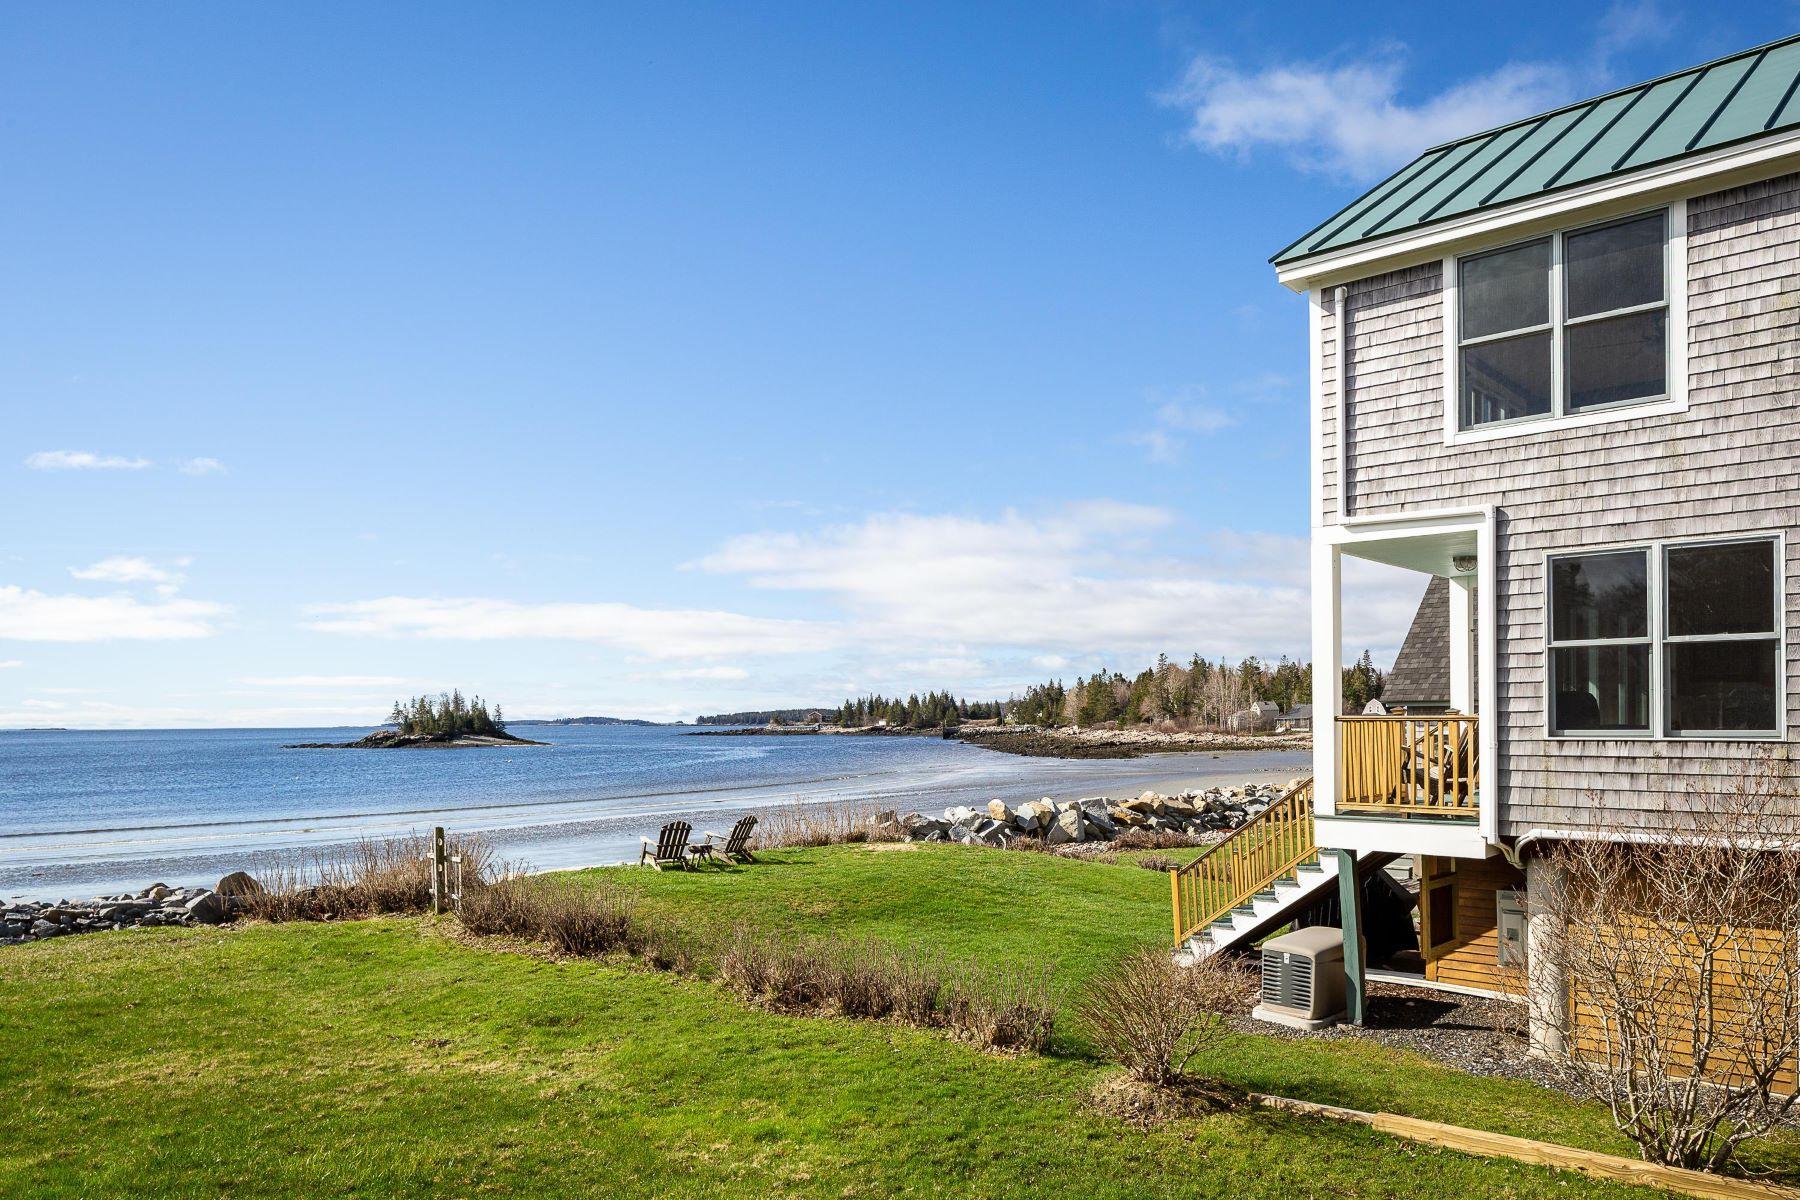 Single Family Homes for Sale at 15 Stonehurst Lane Owls Head, Maine 04854 United States